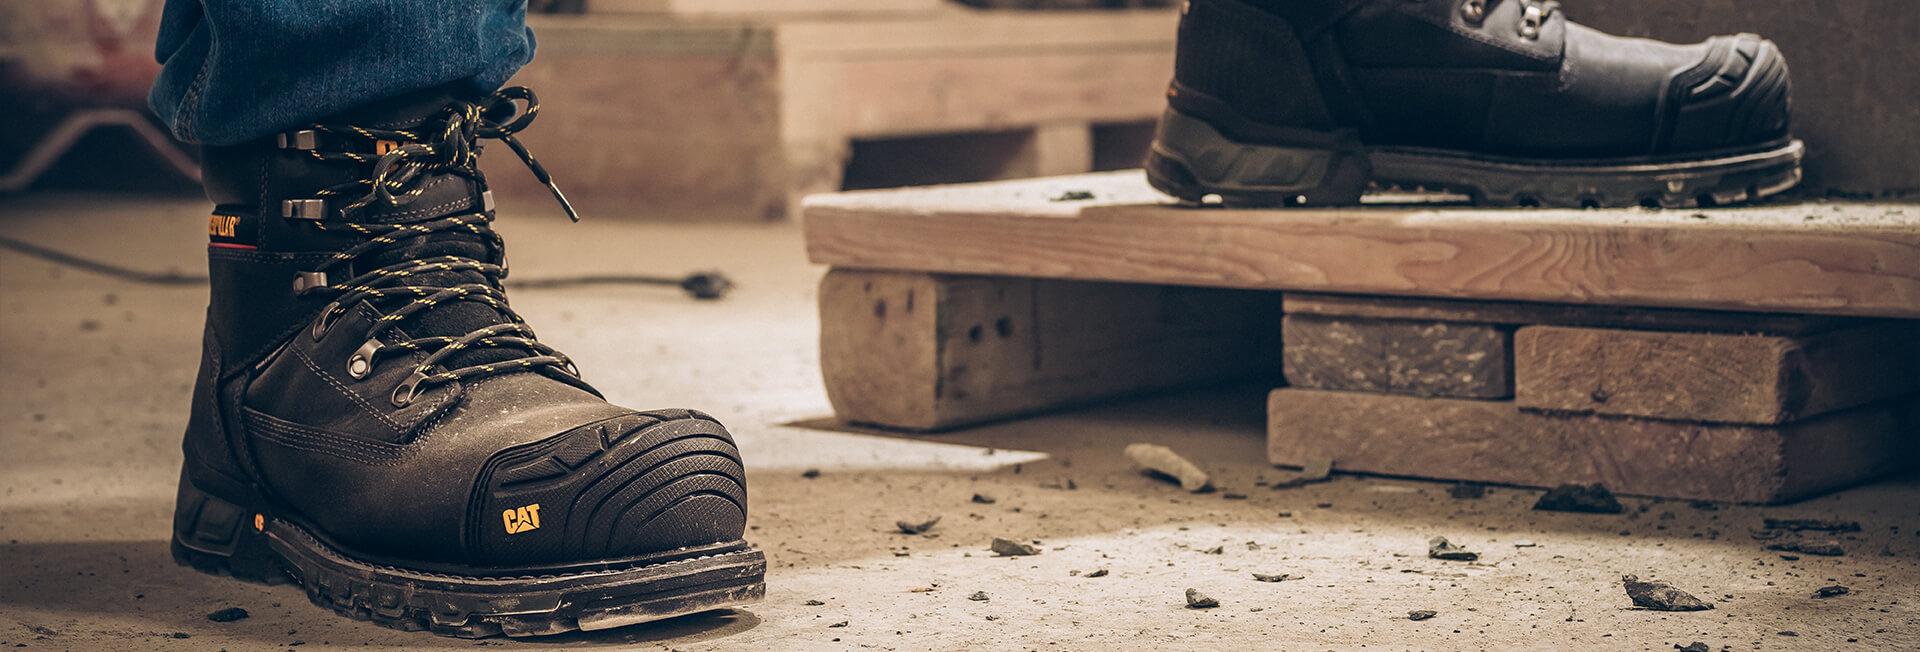 6d4fdfcfd89 Men's Work Boots - Shop Work Shoes For Men | Cat Footwear